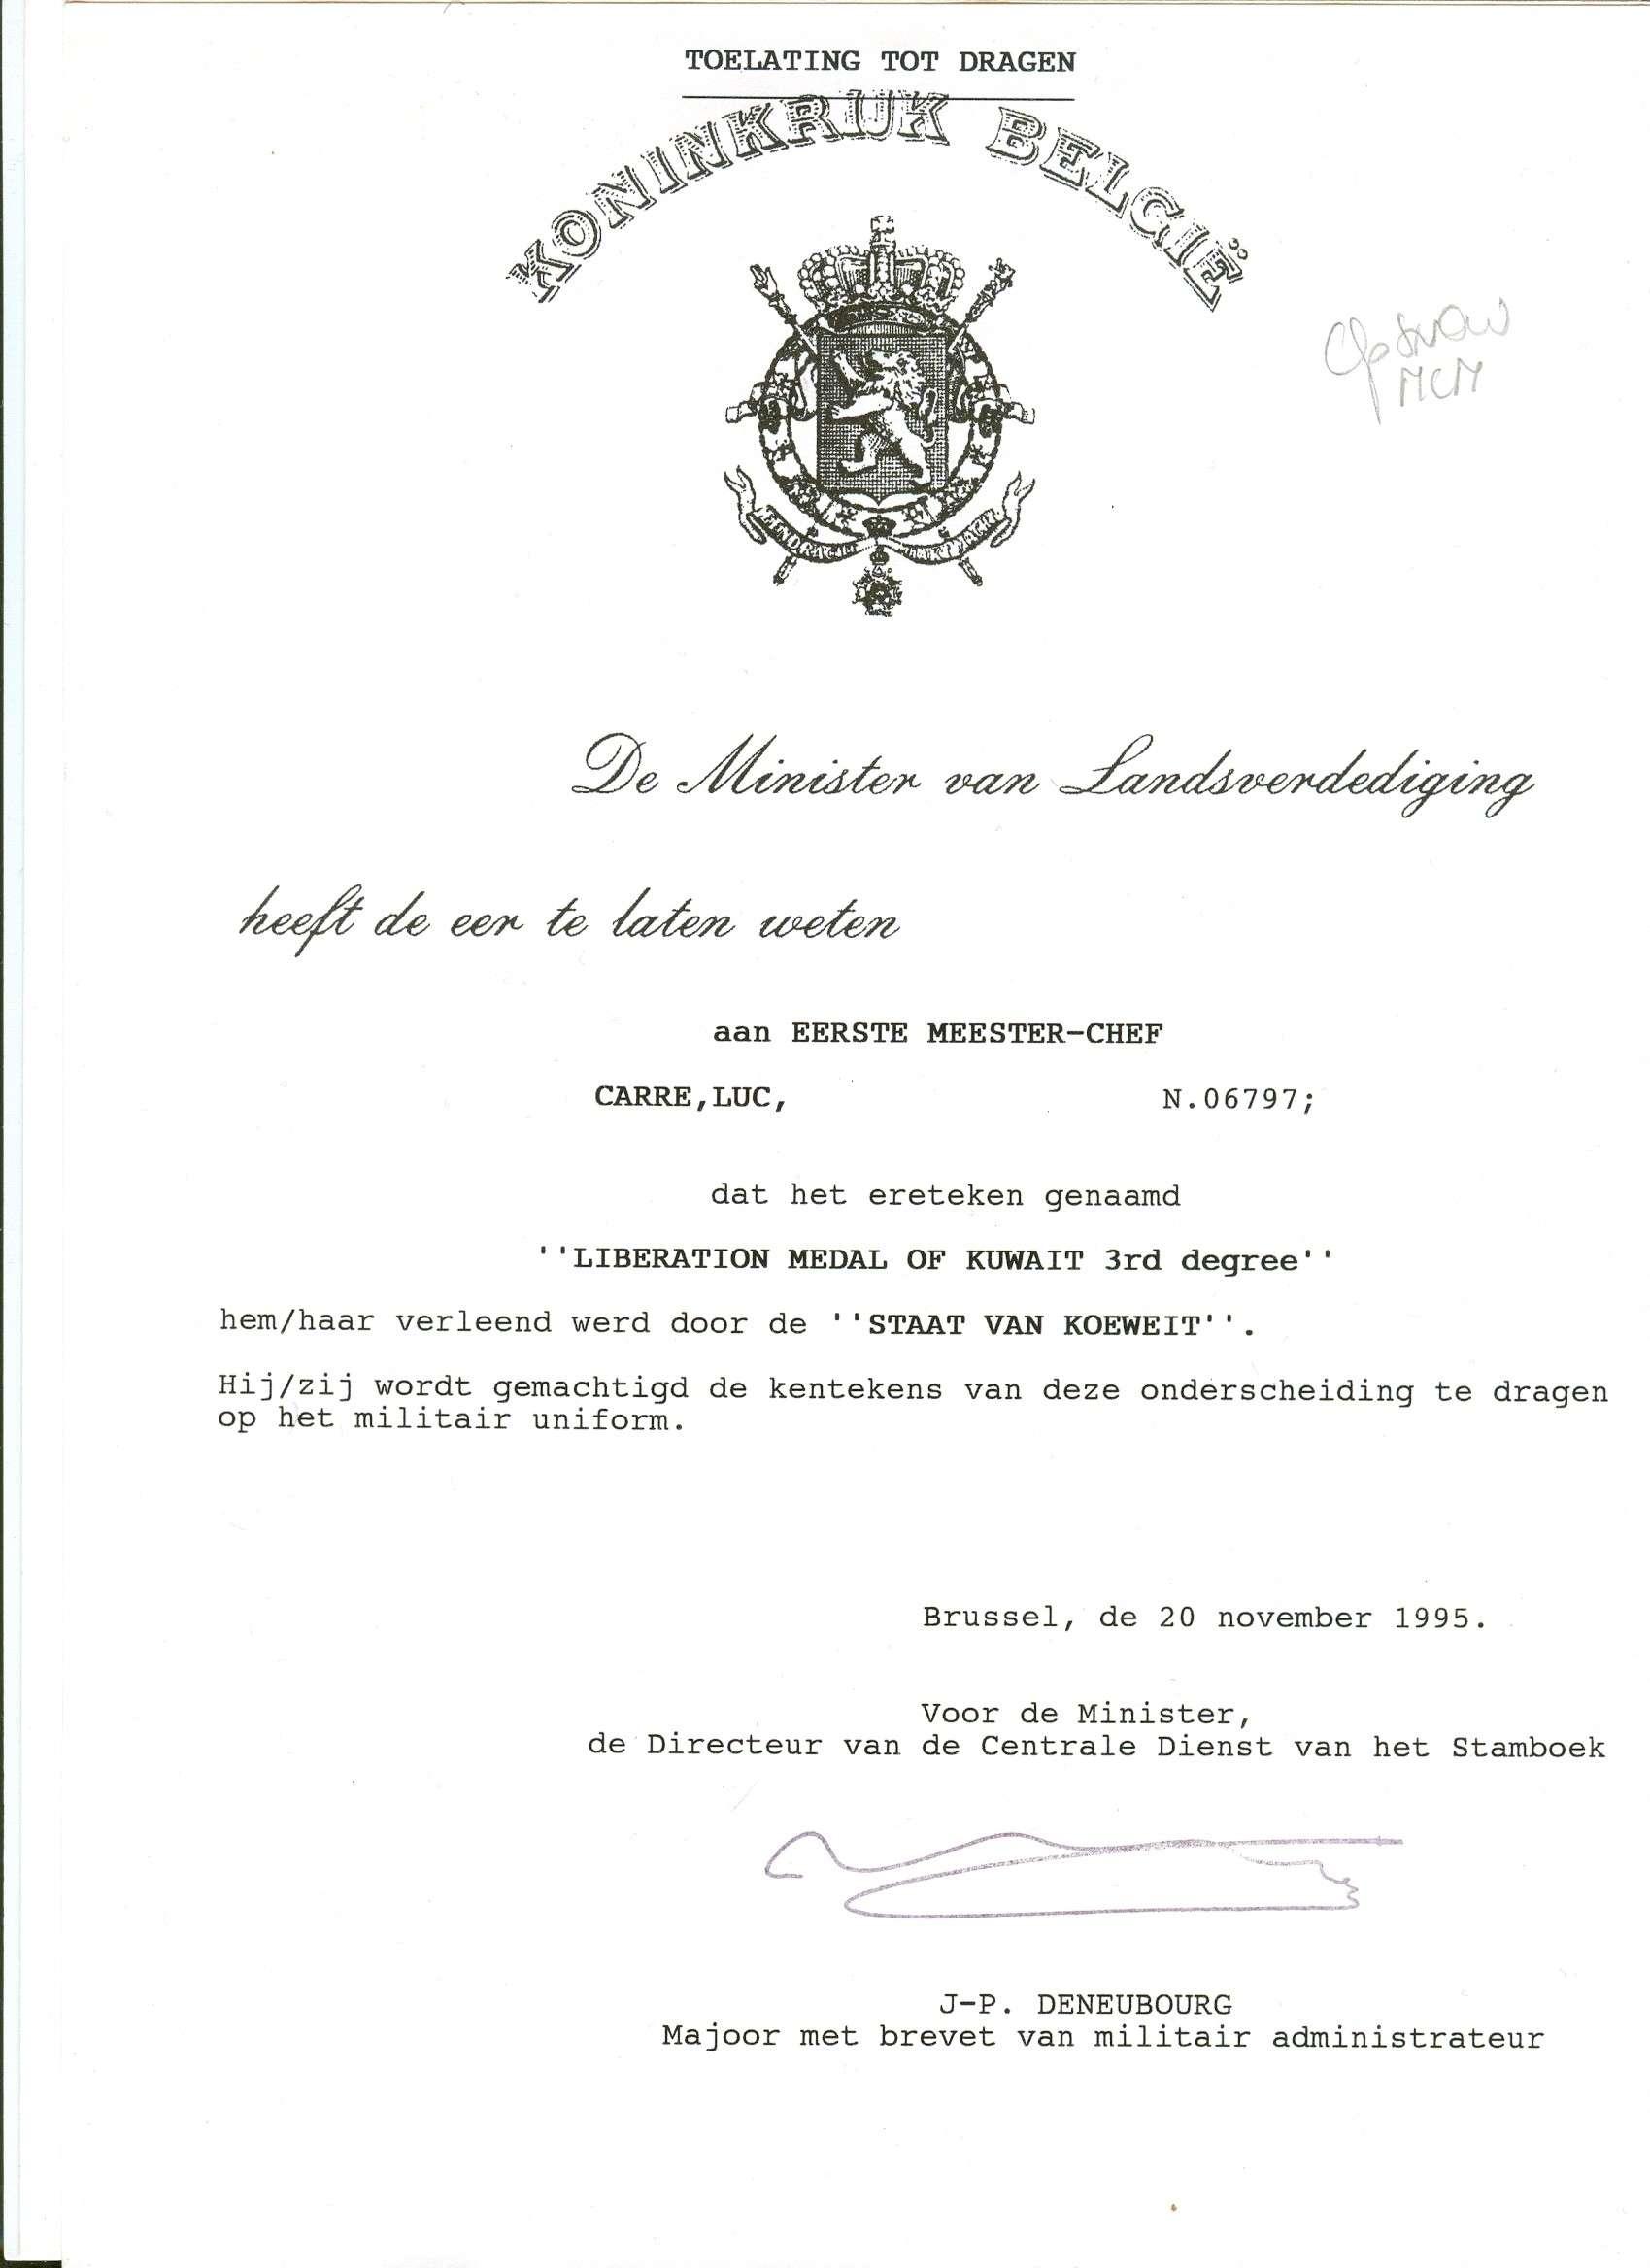 DOCUMENTS GUERRE DU GOLF (DESERT STORM) Luk00223